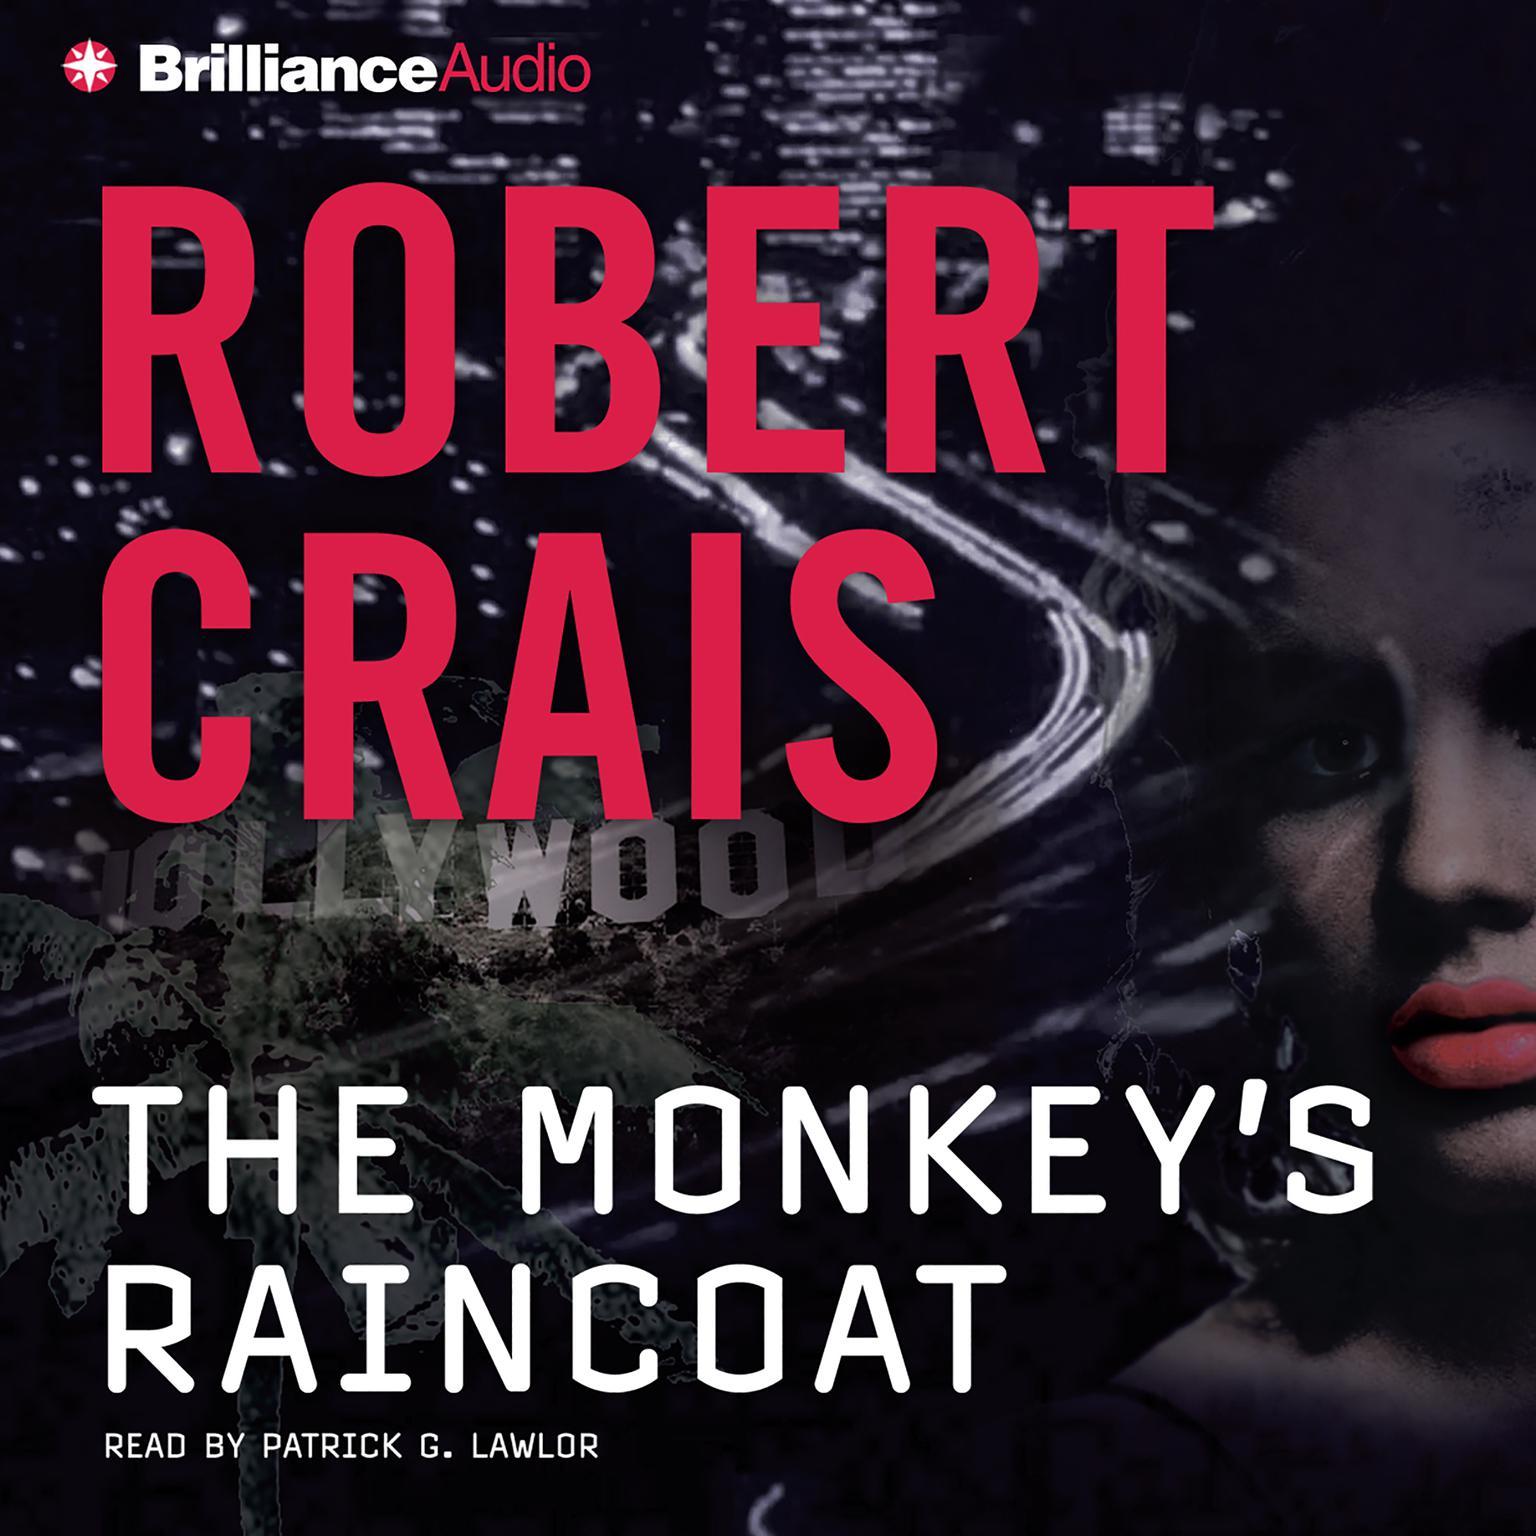 The Monkeys Raincoat (Abridged) Audiobook, by Robert Crais